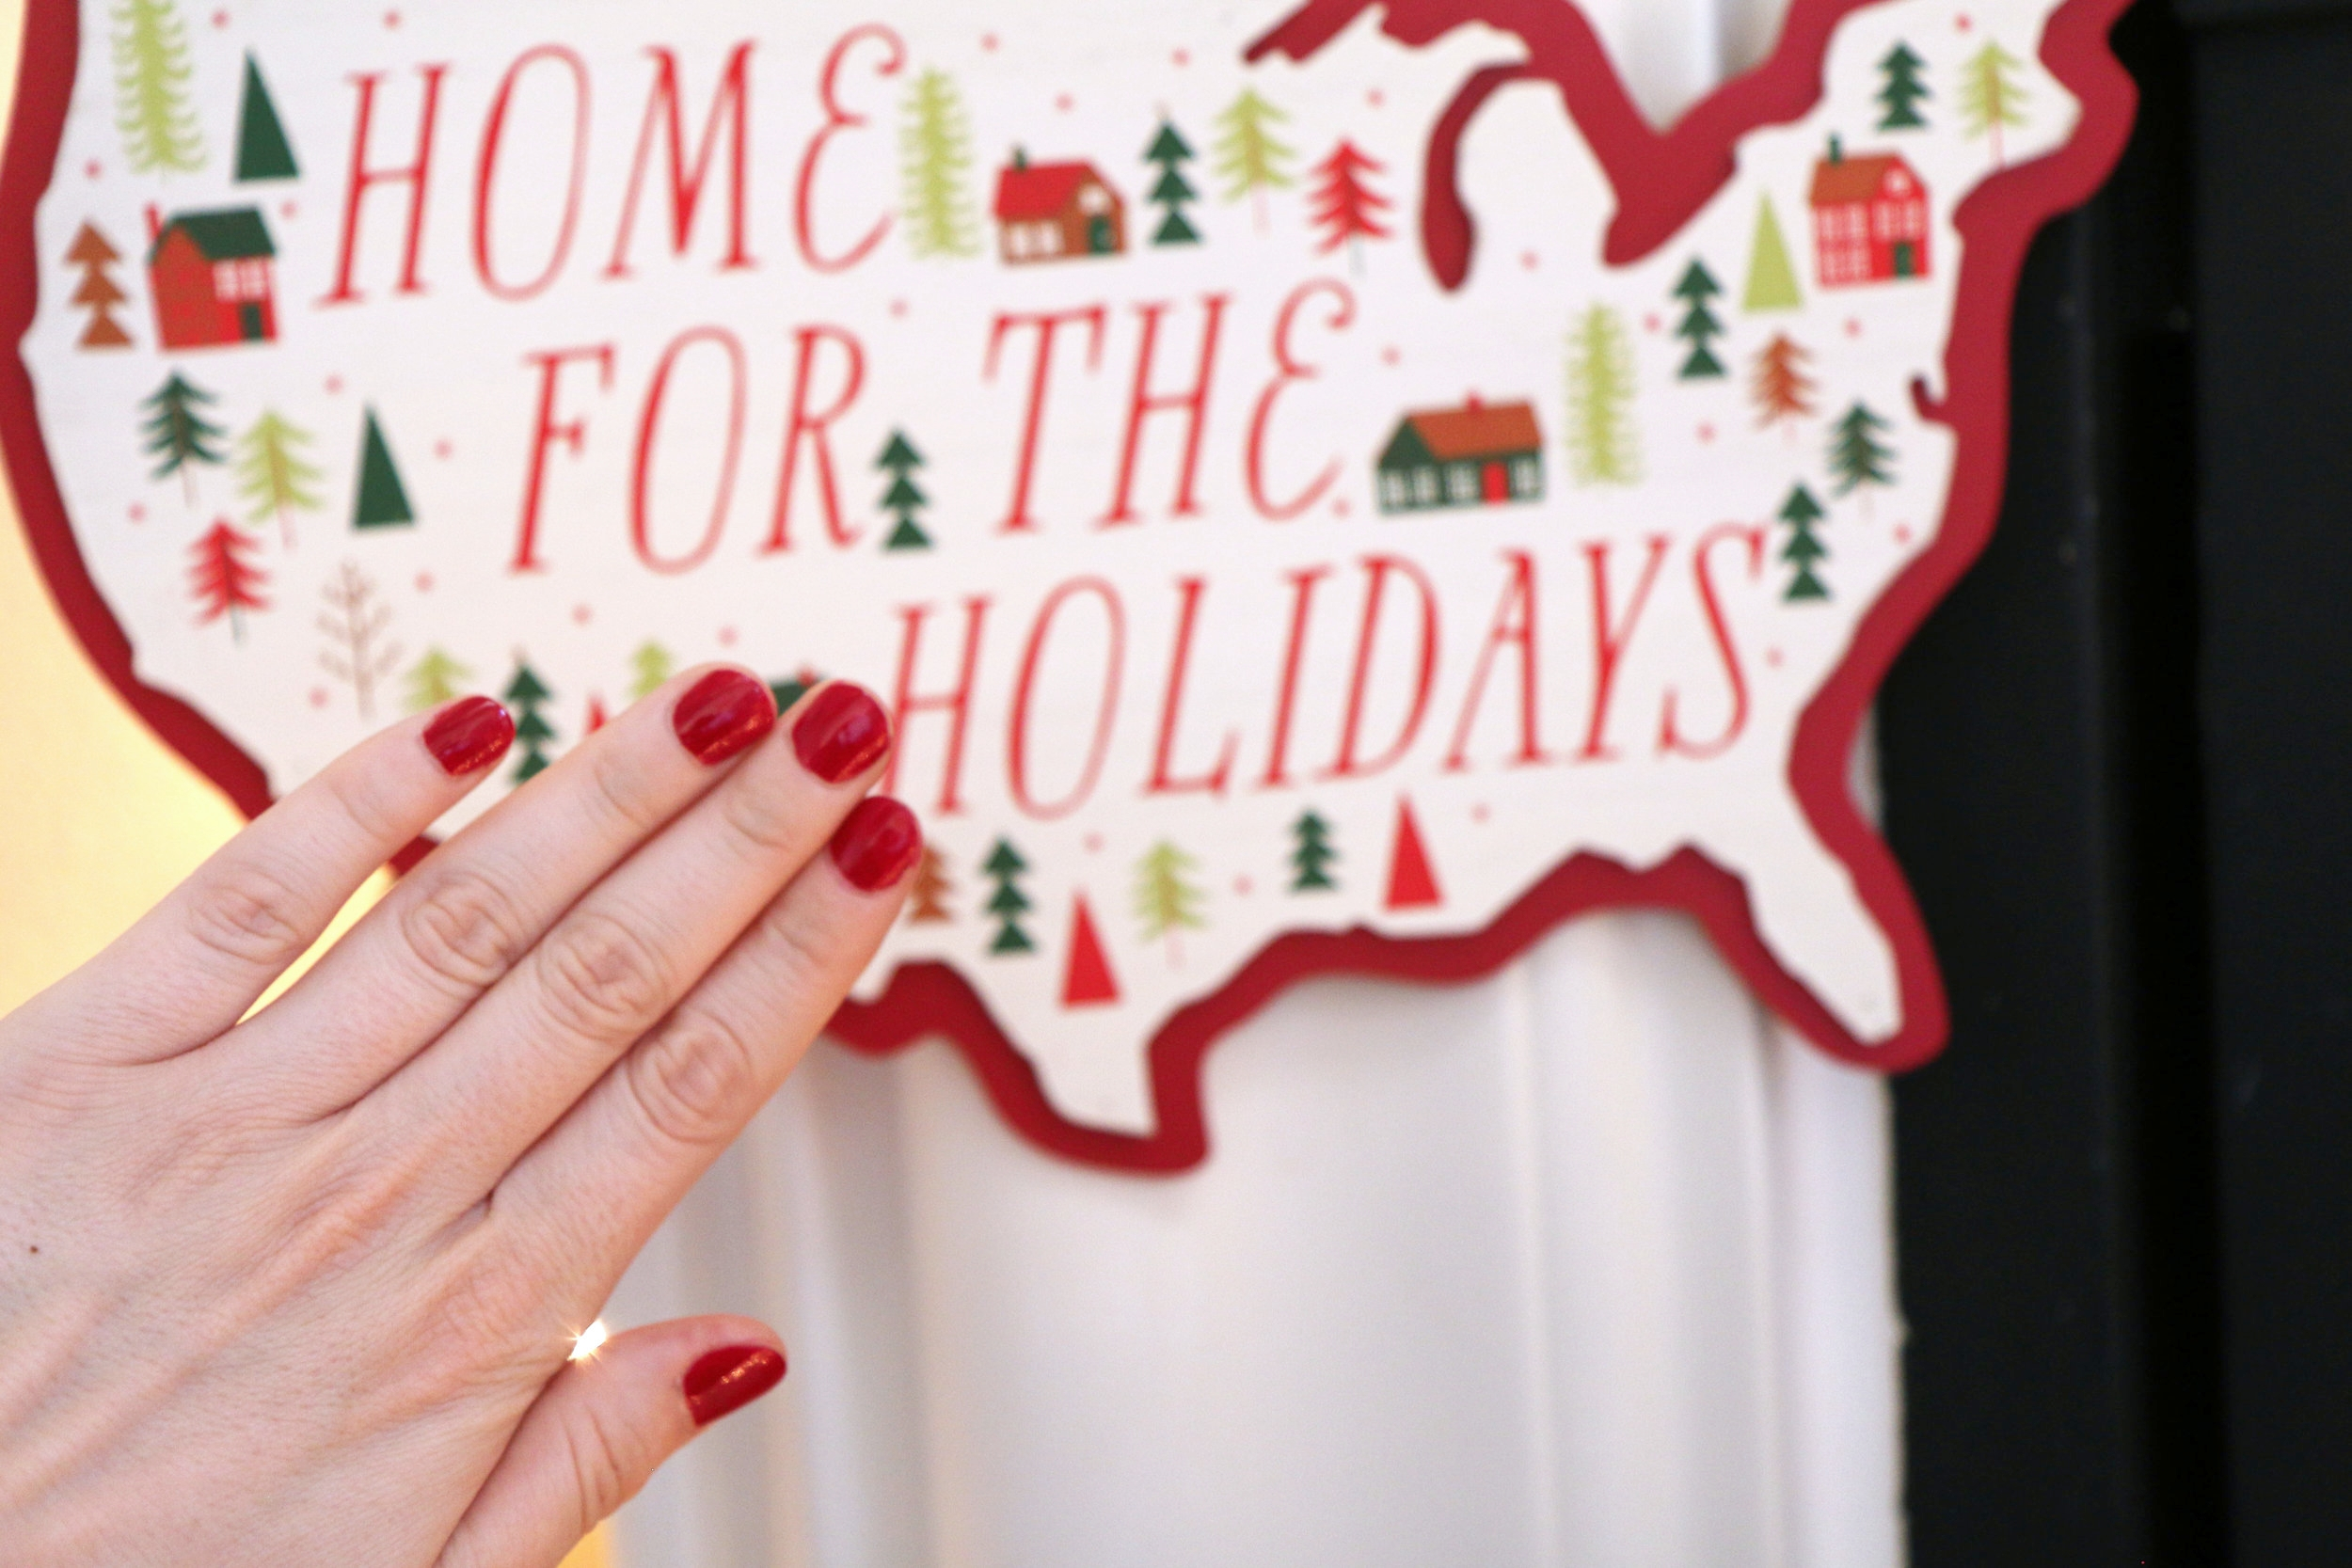 Christmas Red OPI Nail Polish